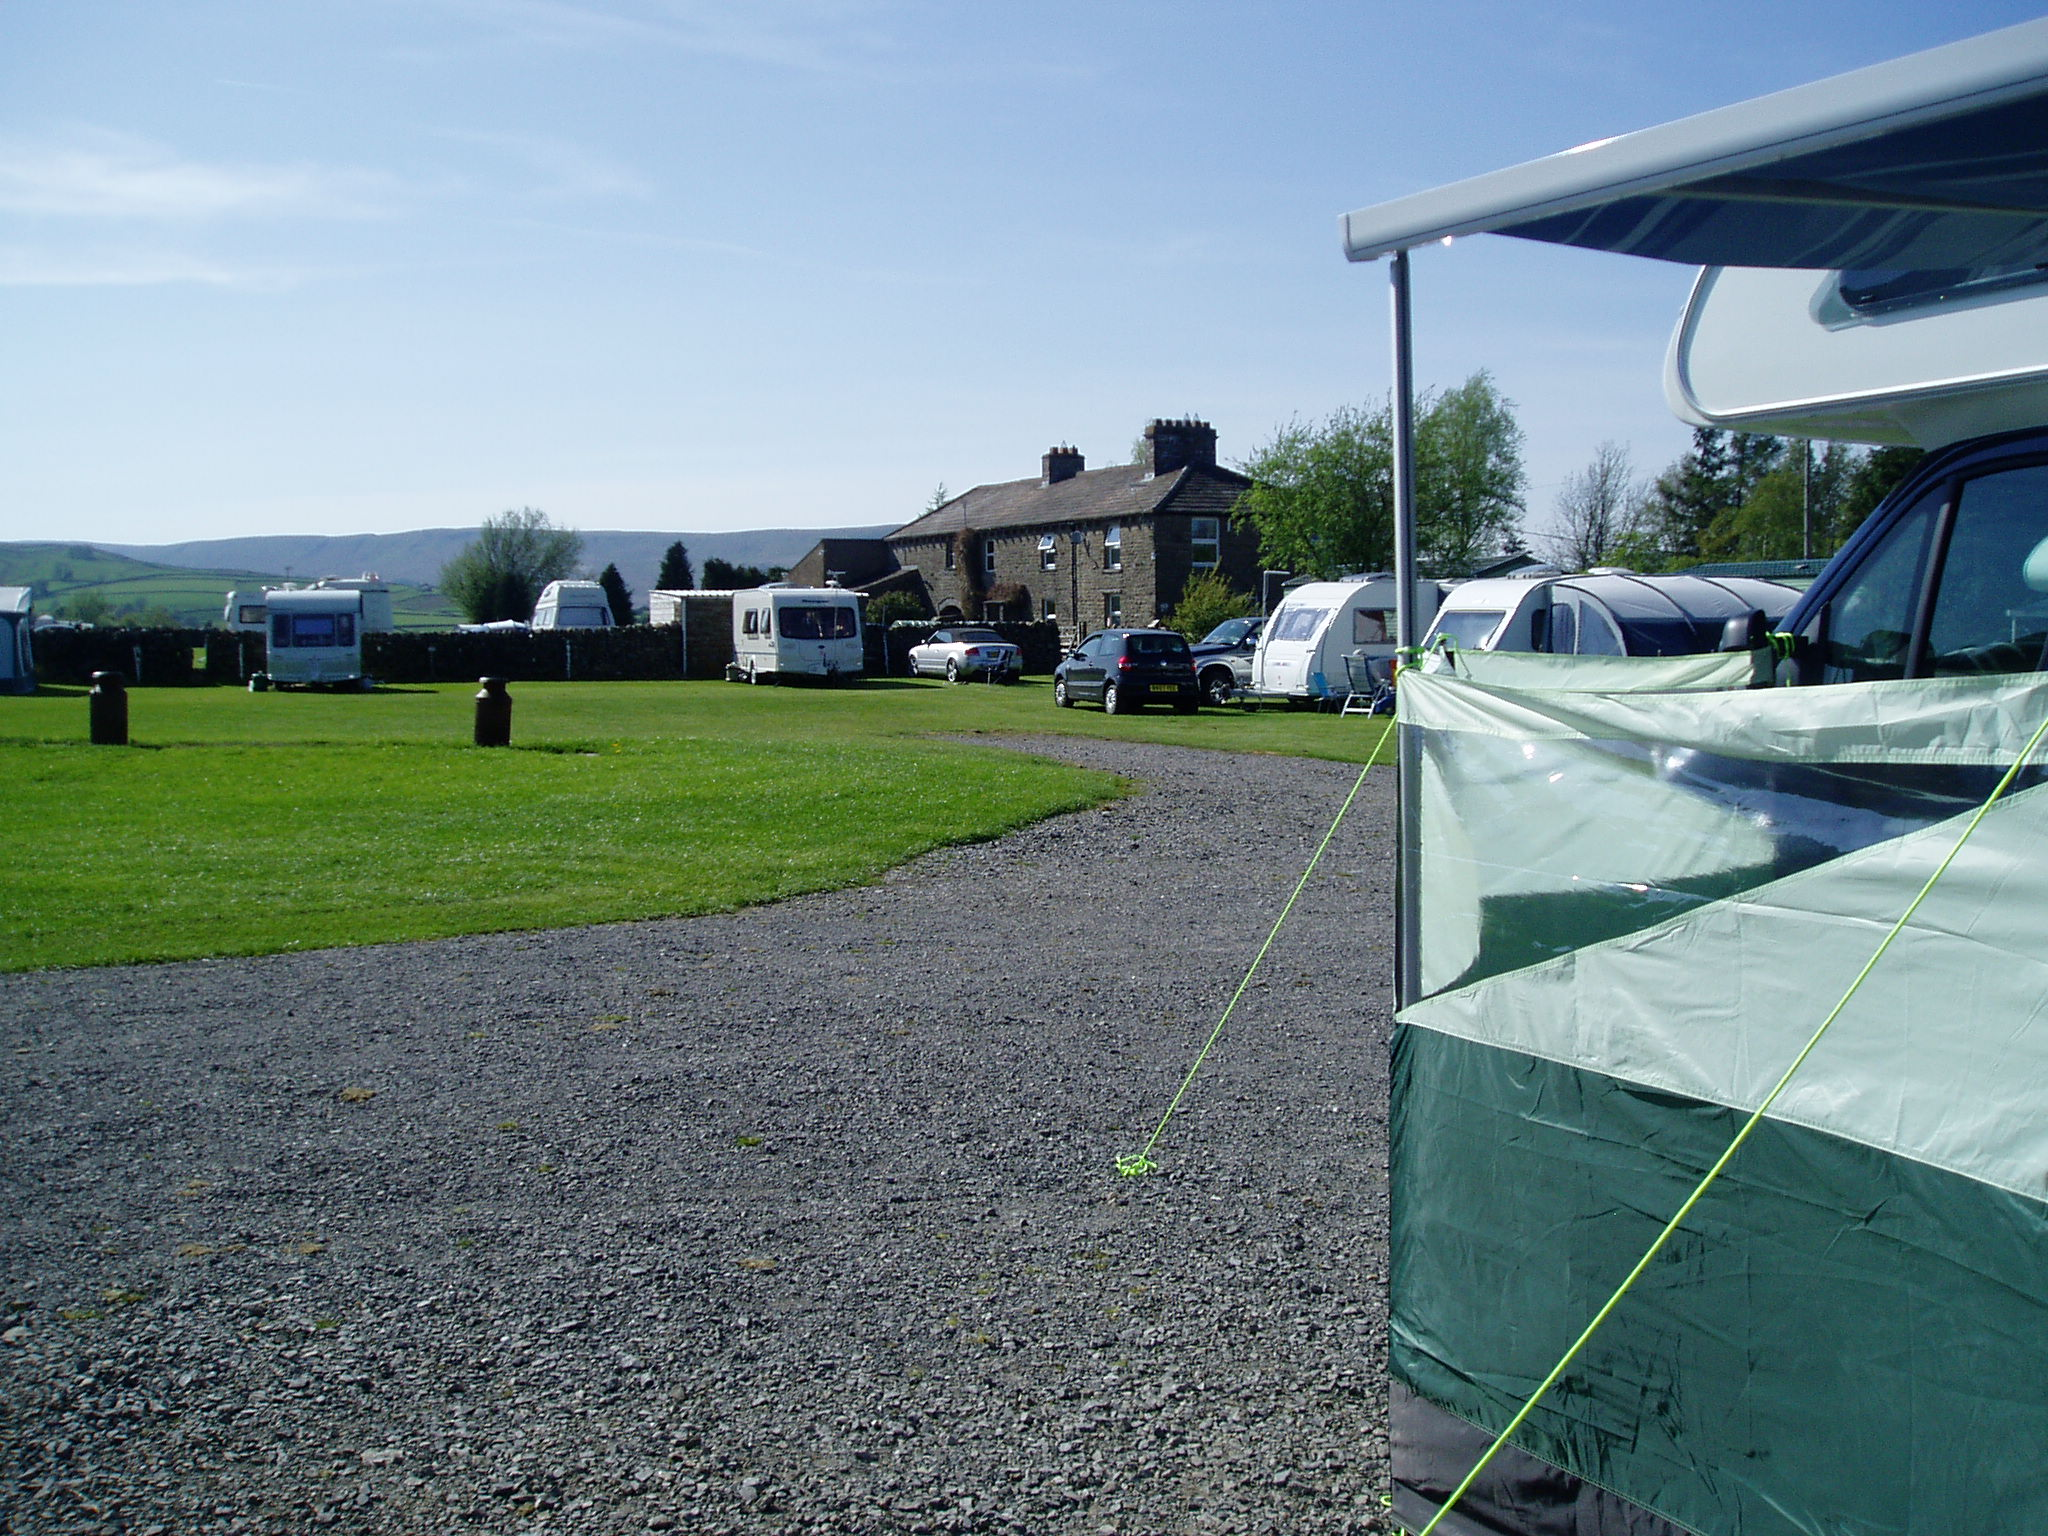 Bainbridge Ings Caravan & Campsite